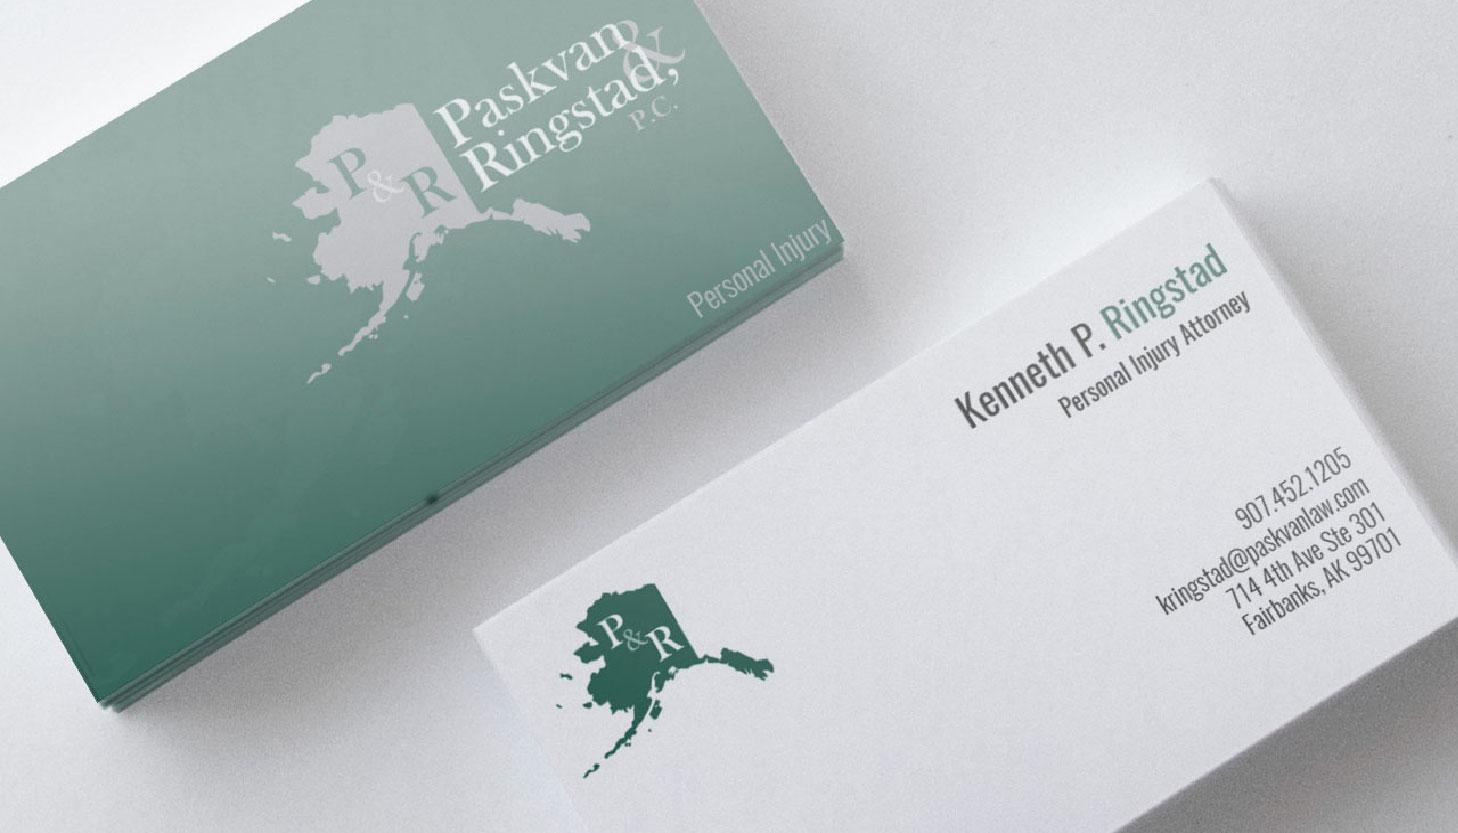 Paskvan & Ringstad, PC | Print Design | Luke Sillies Design